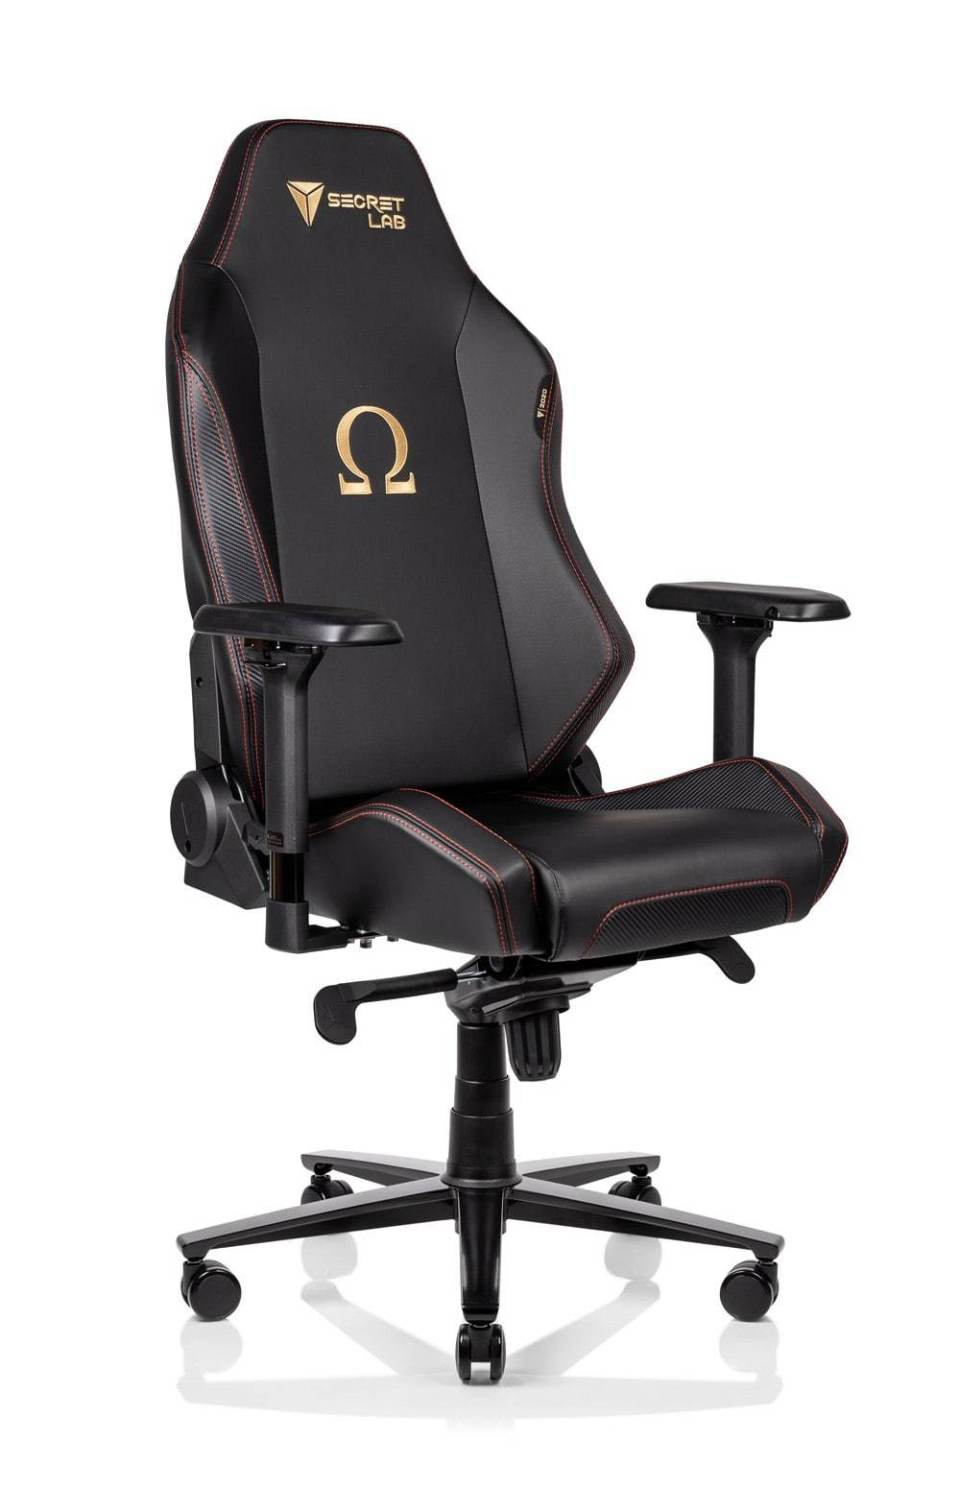 Secretlab Omega Best Ergonomic Chairs in Singapore